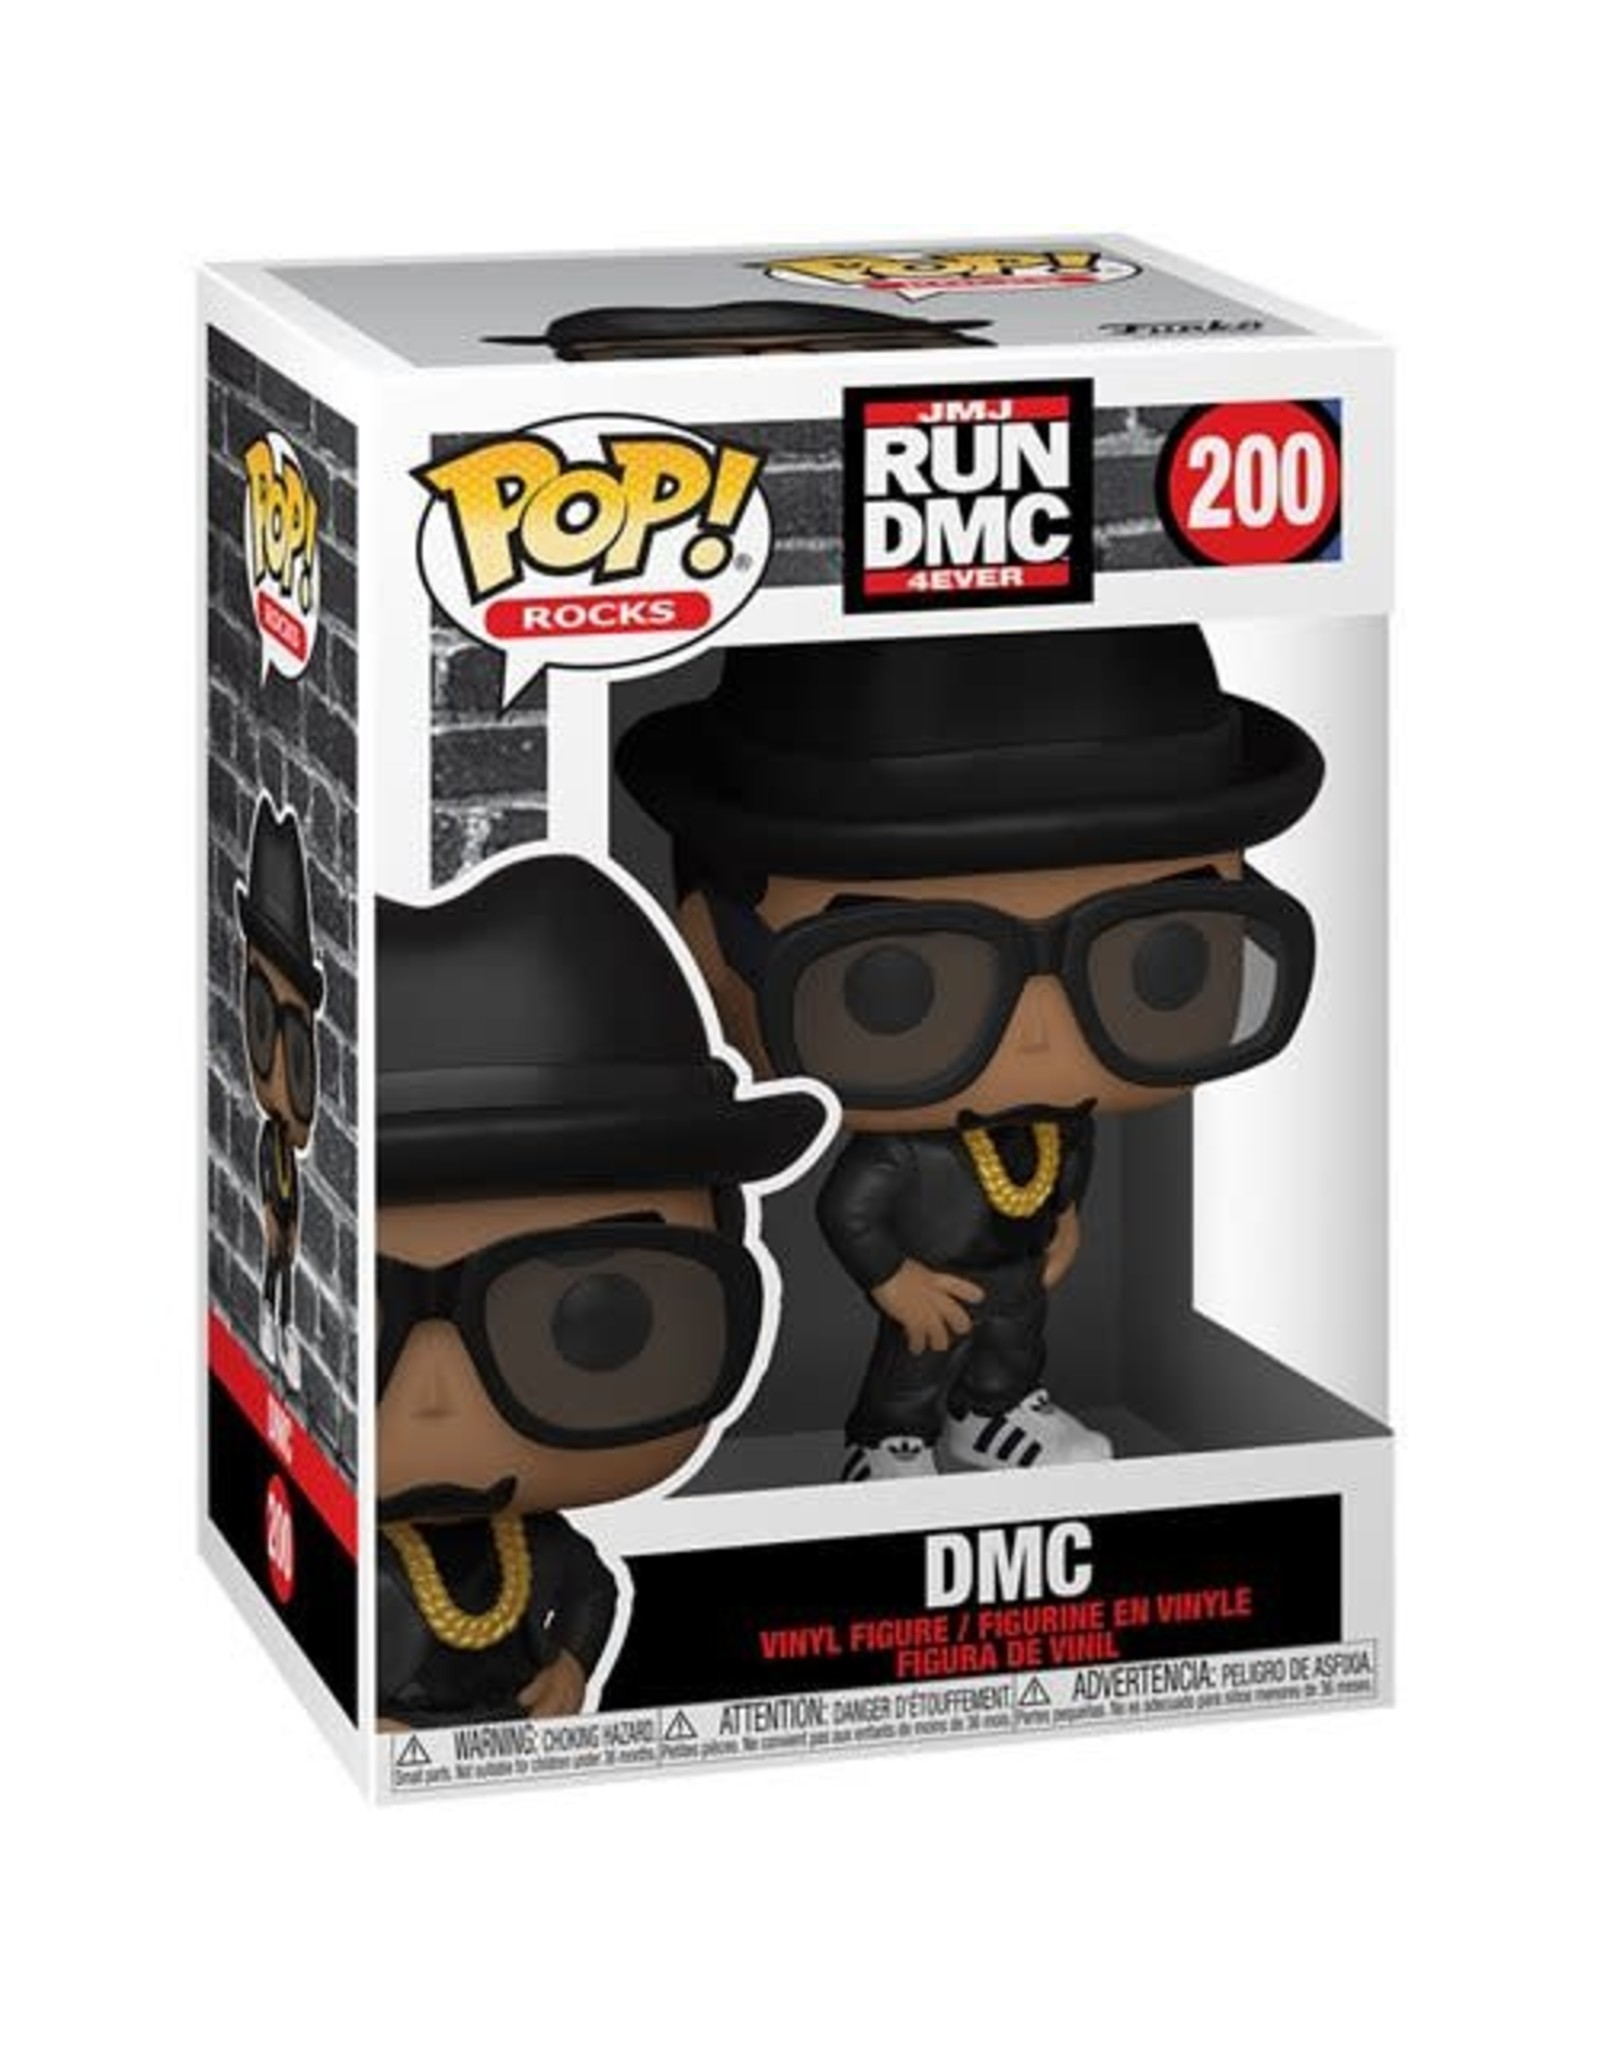 Funko Run DMC DMC Pop! Vinyl Figure